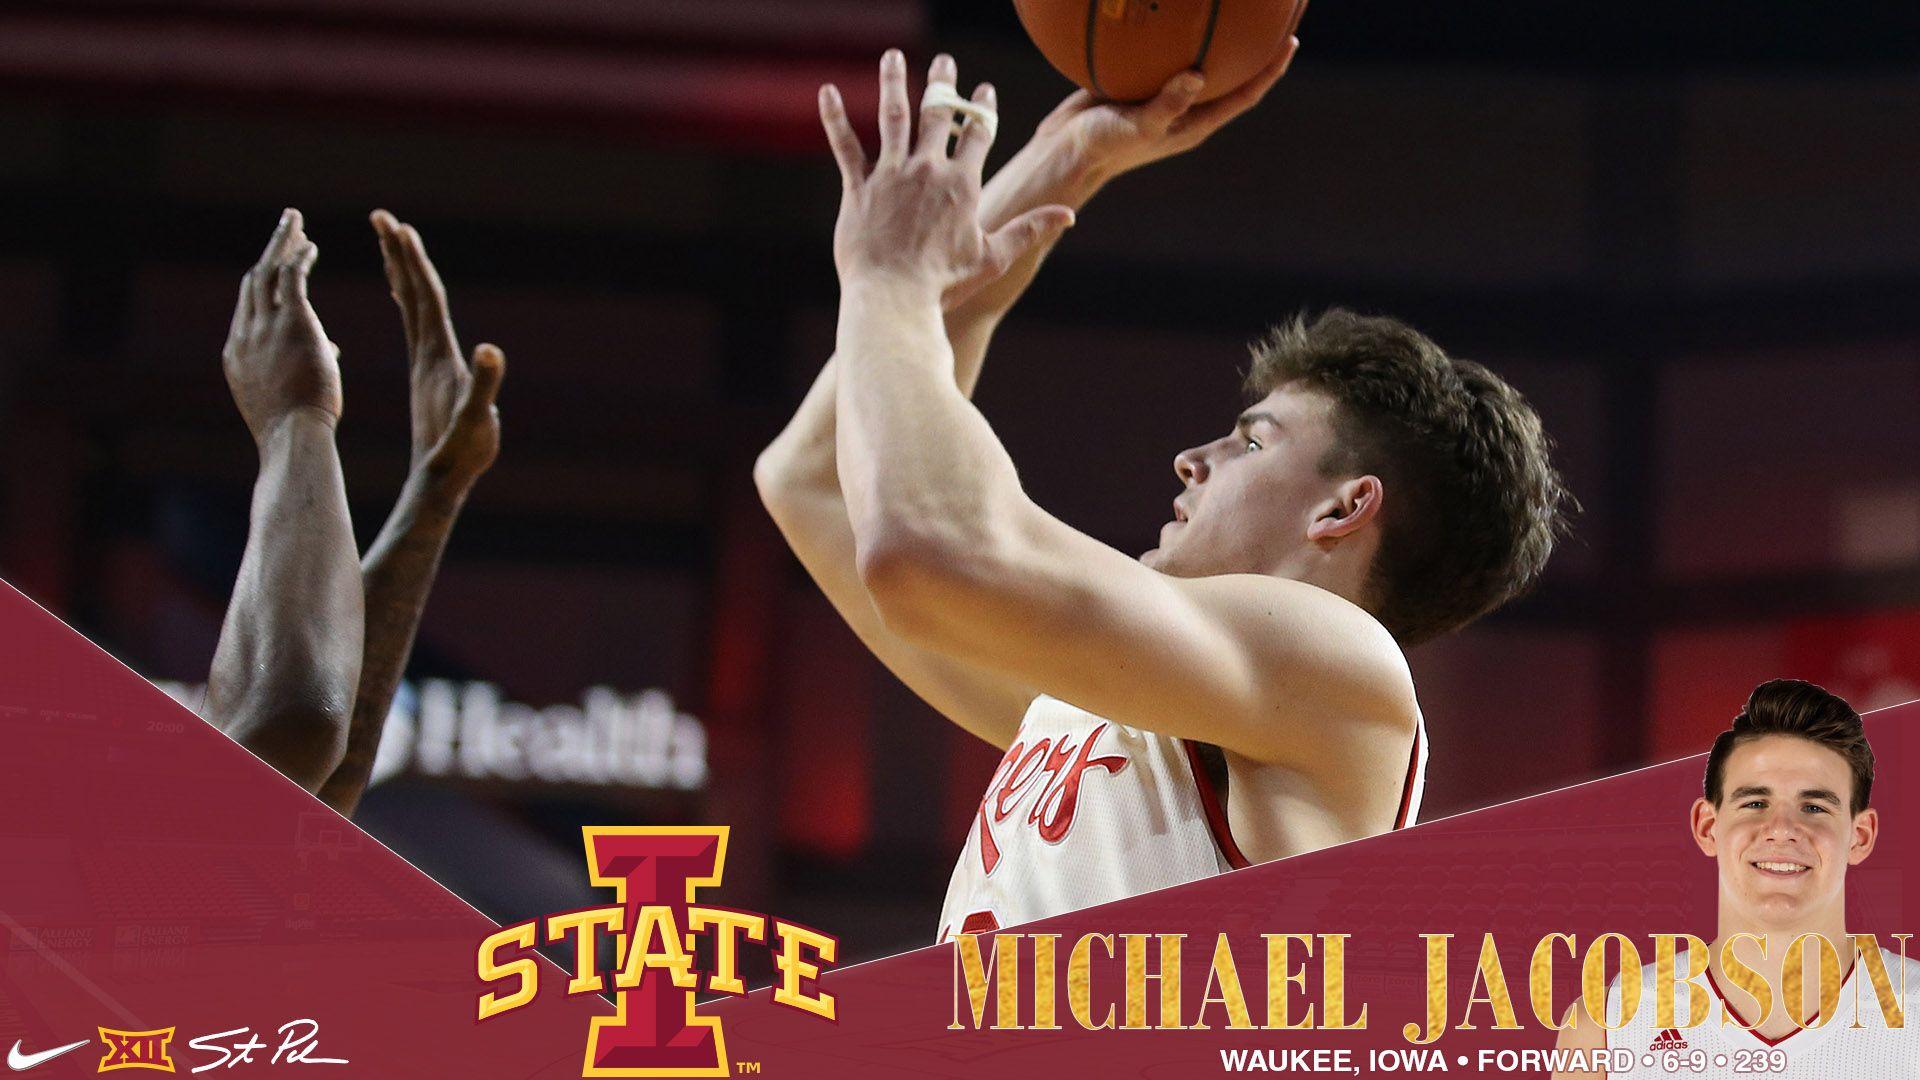 Iowa State Gained A Waukee Iowa Native Michael Jacobson As A